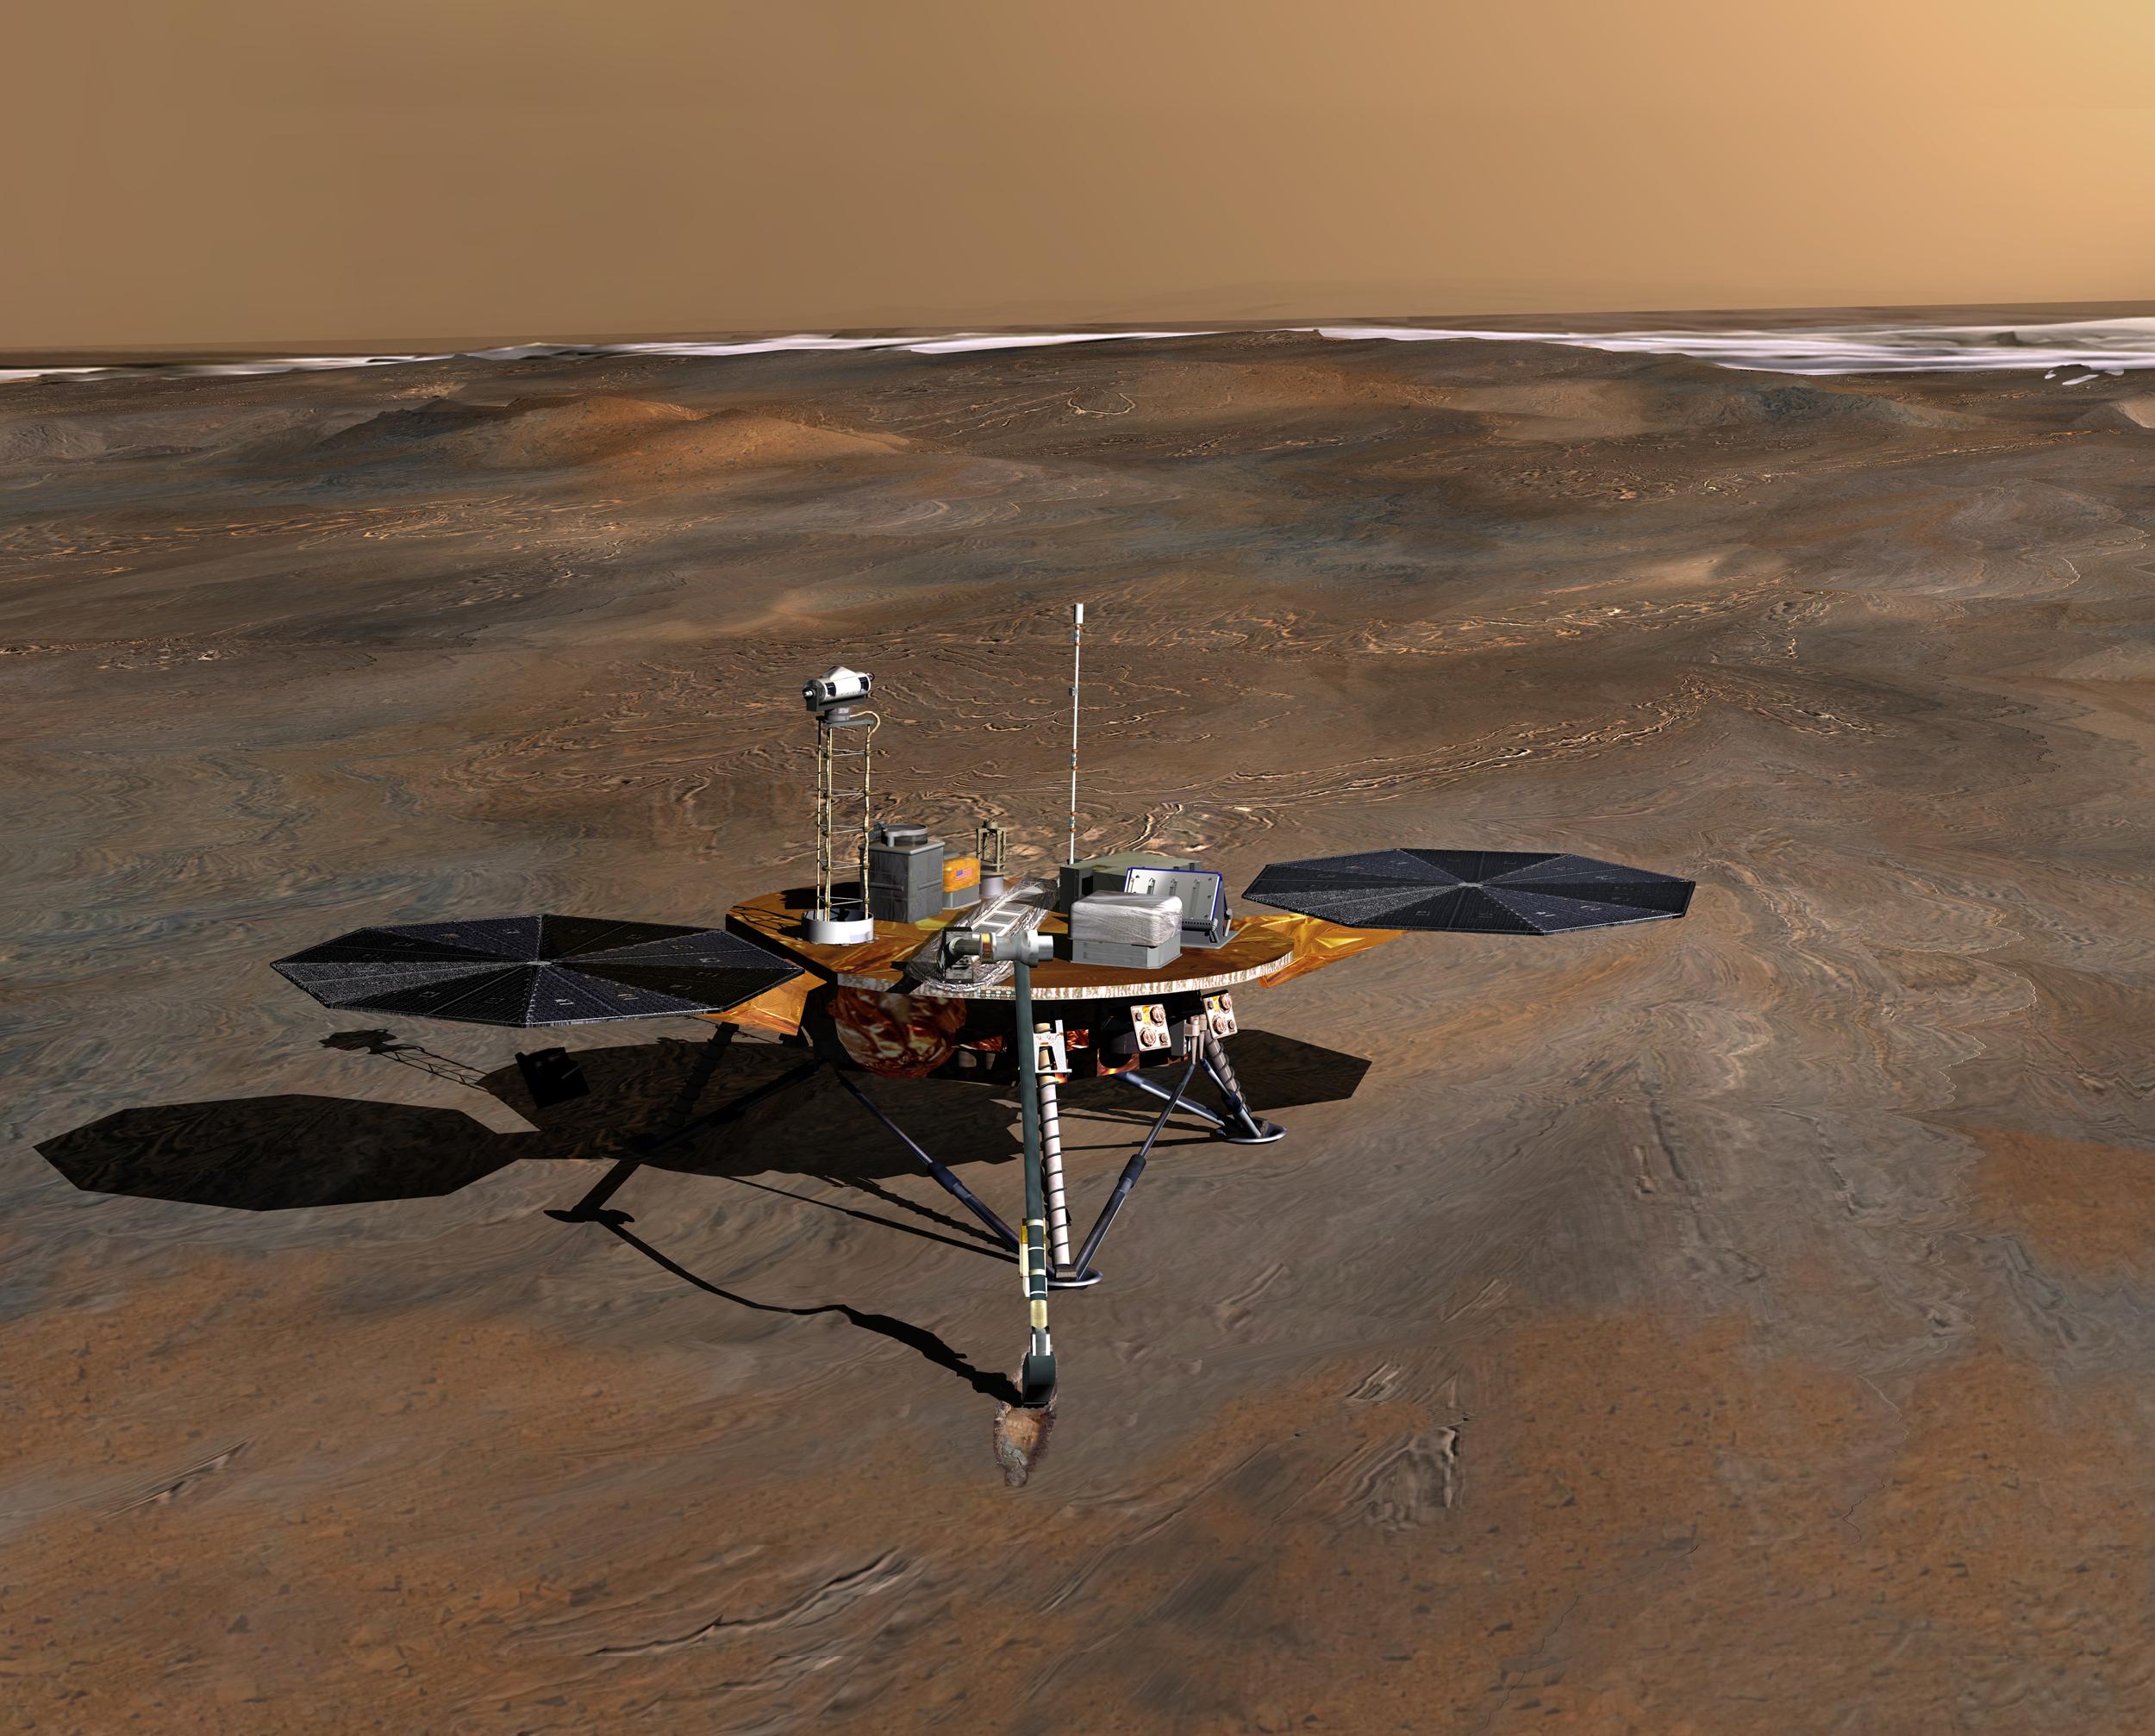 nasa phoenix lander - photo #13